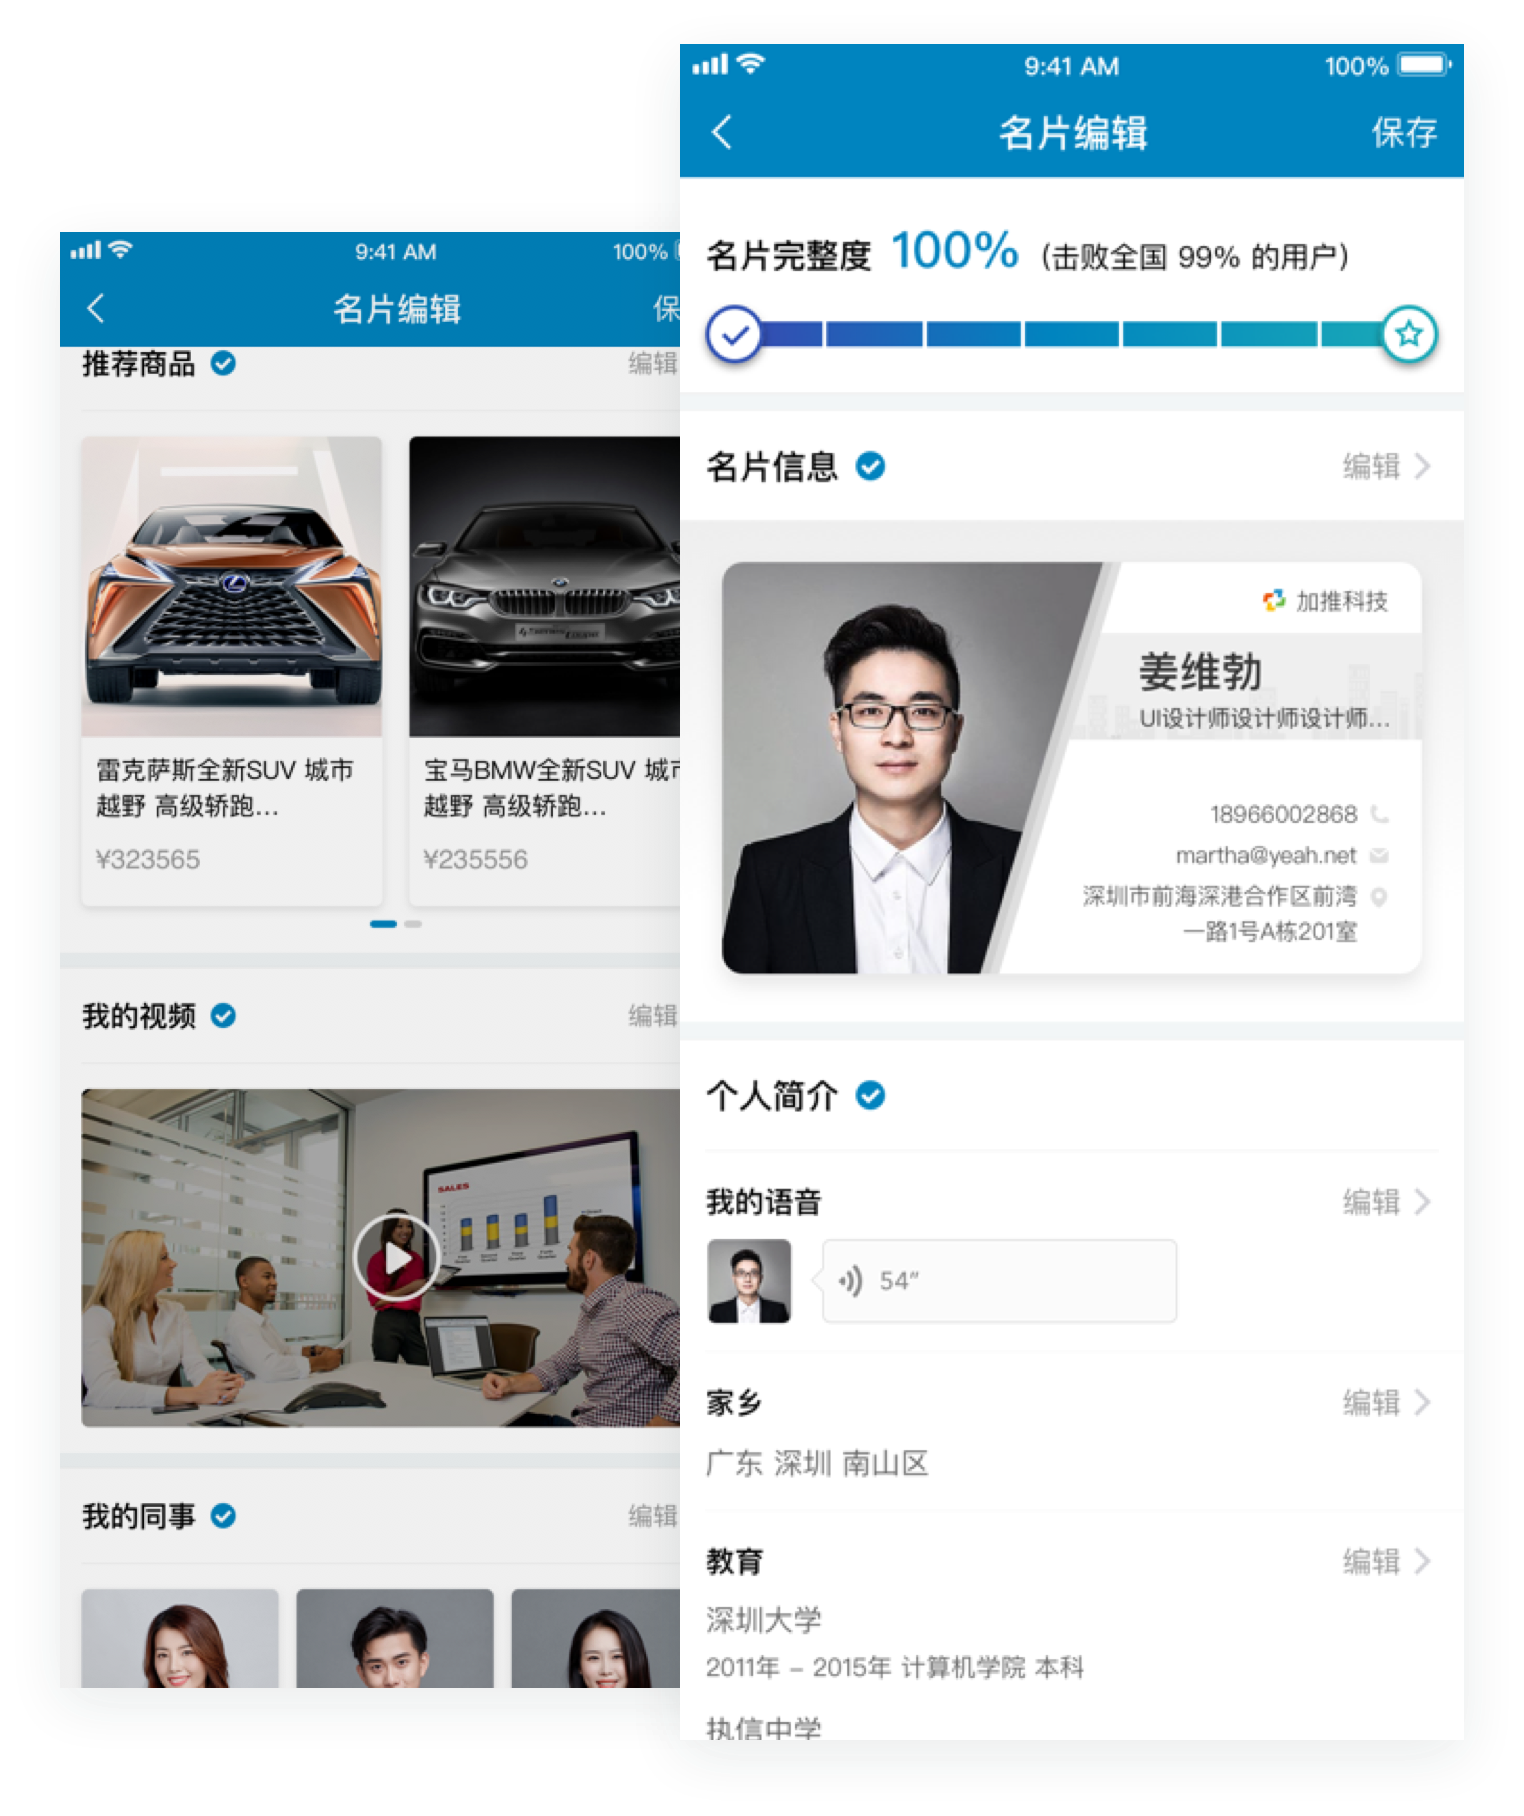 app下载介绍